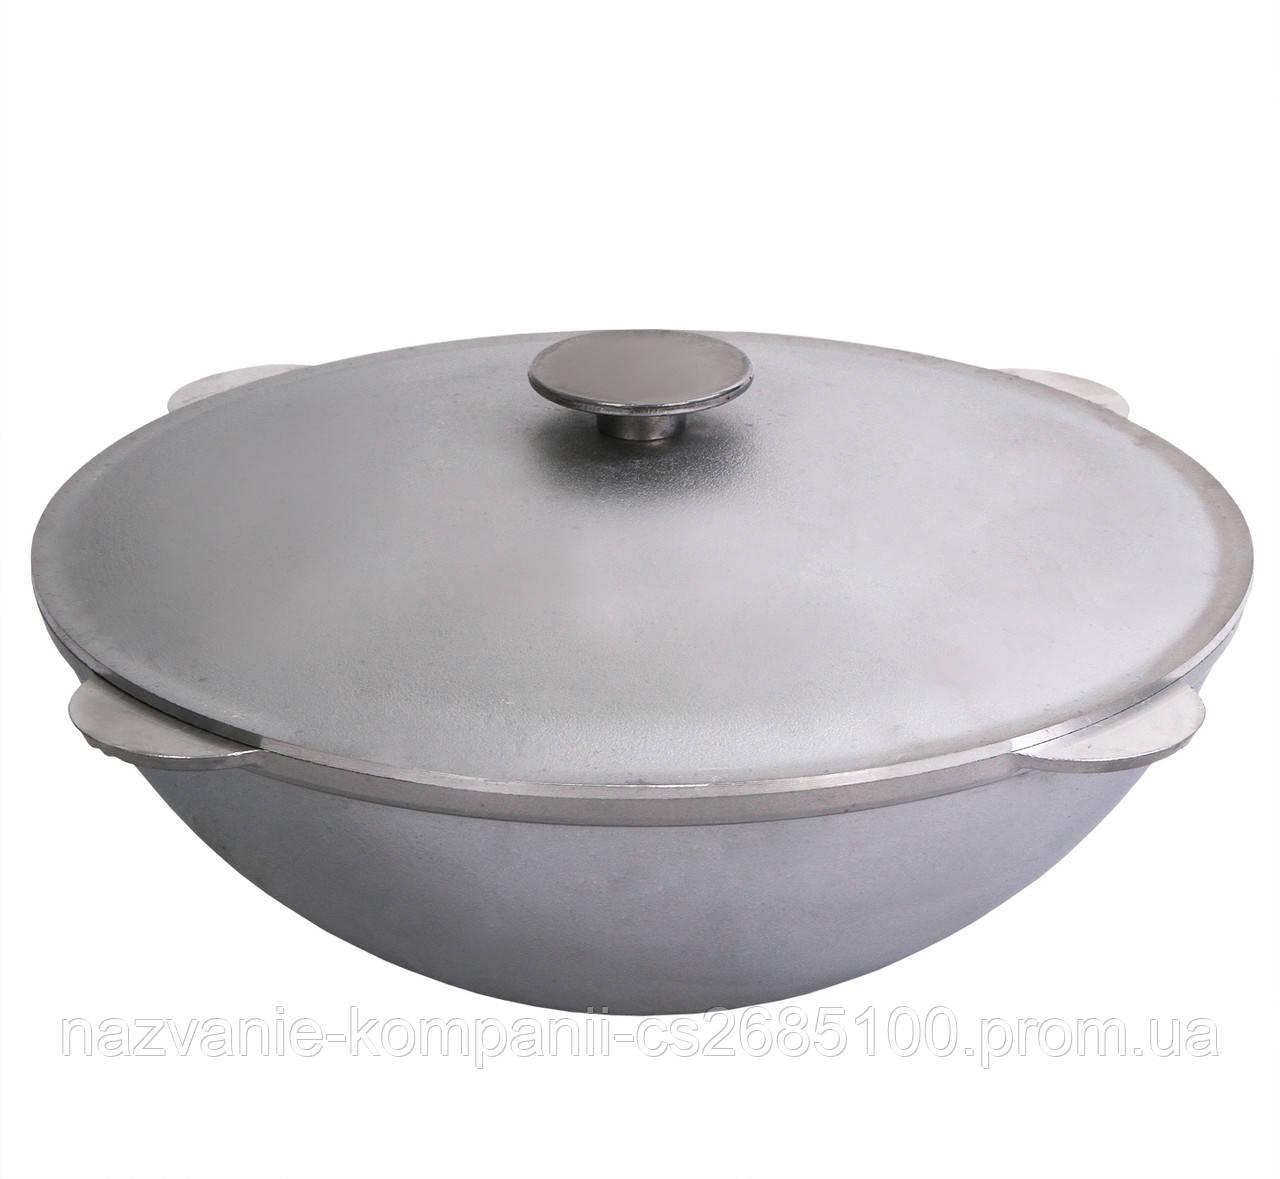 Казан алюминиевый Татарский на 12 литра